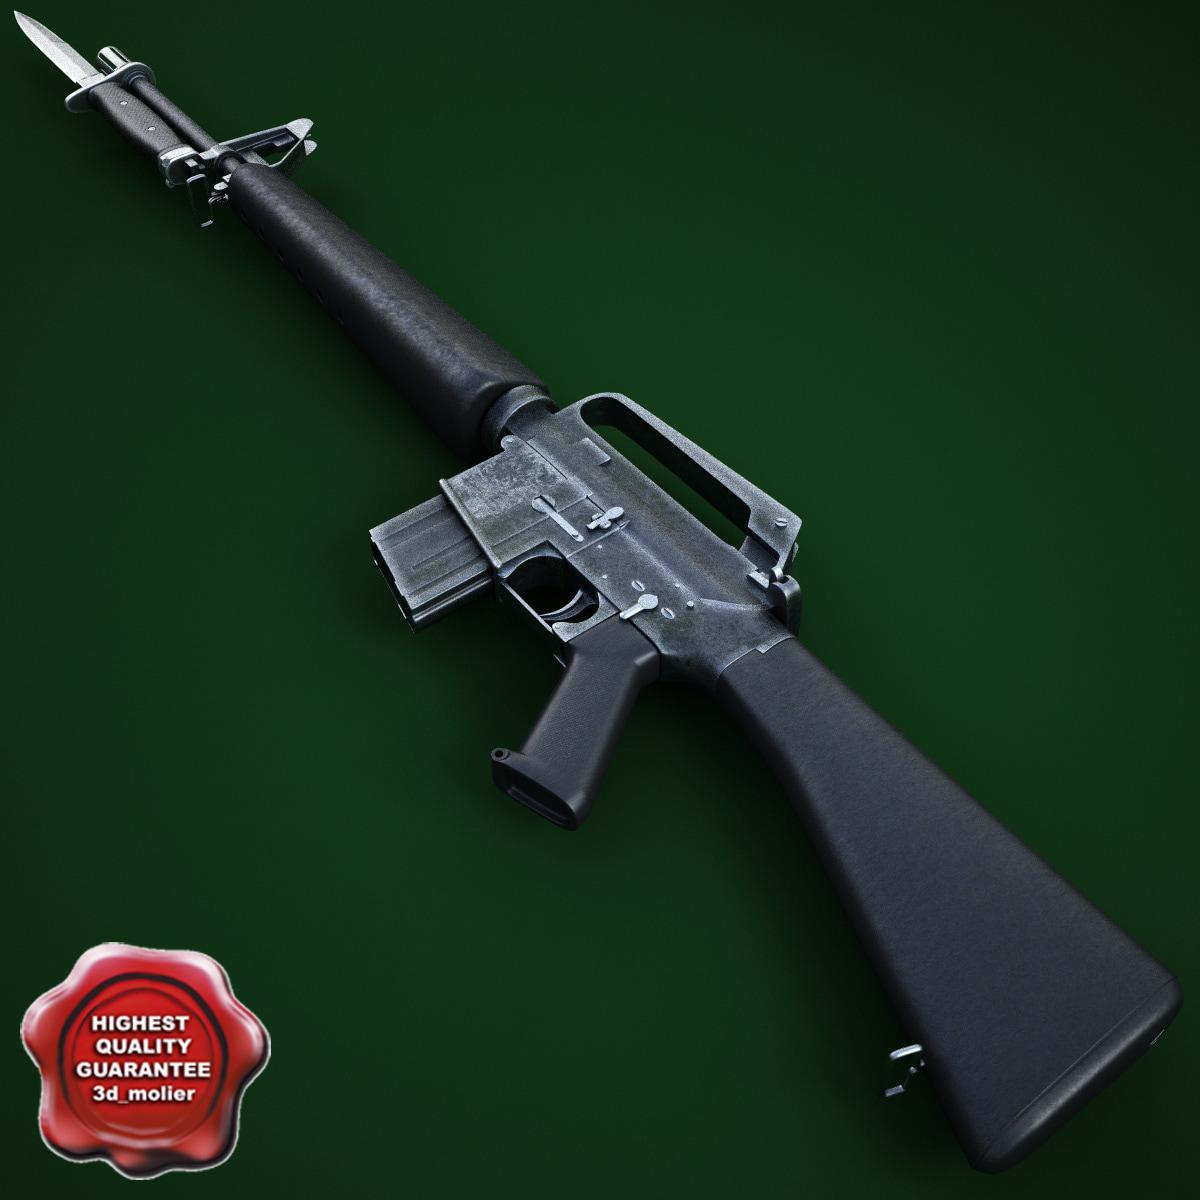 M16A1 Assault Rifle with M7 Bayonet